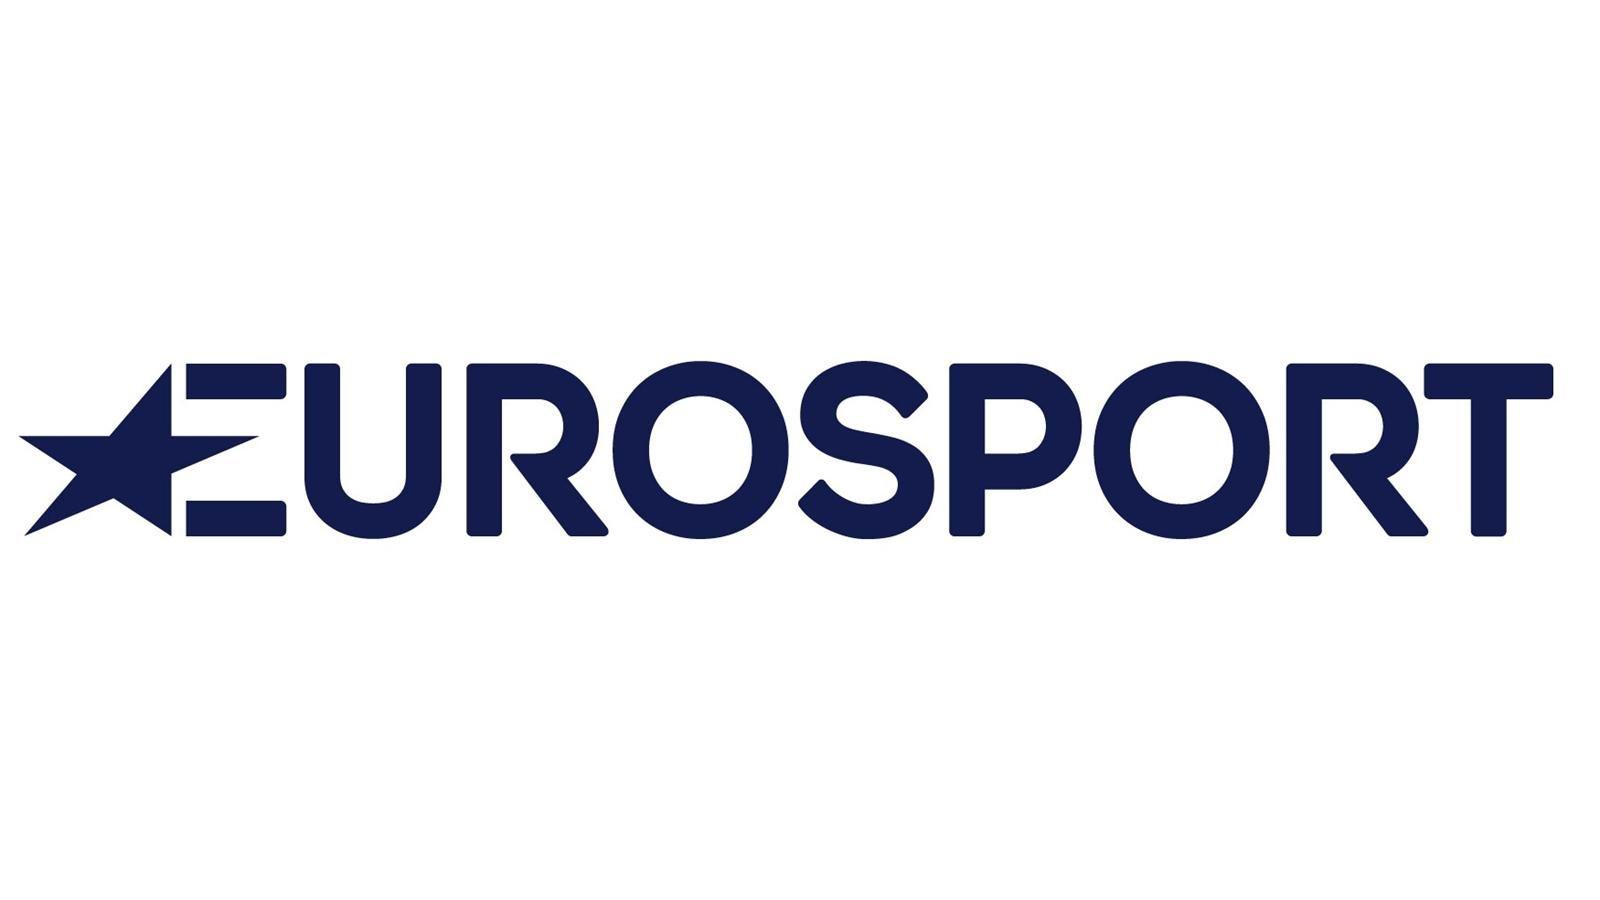 Risultati immagini per eurosport basket